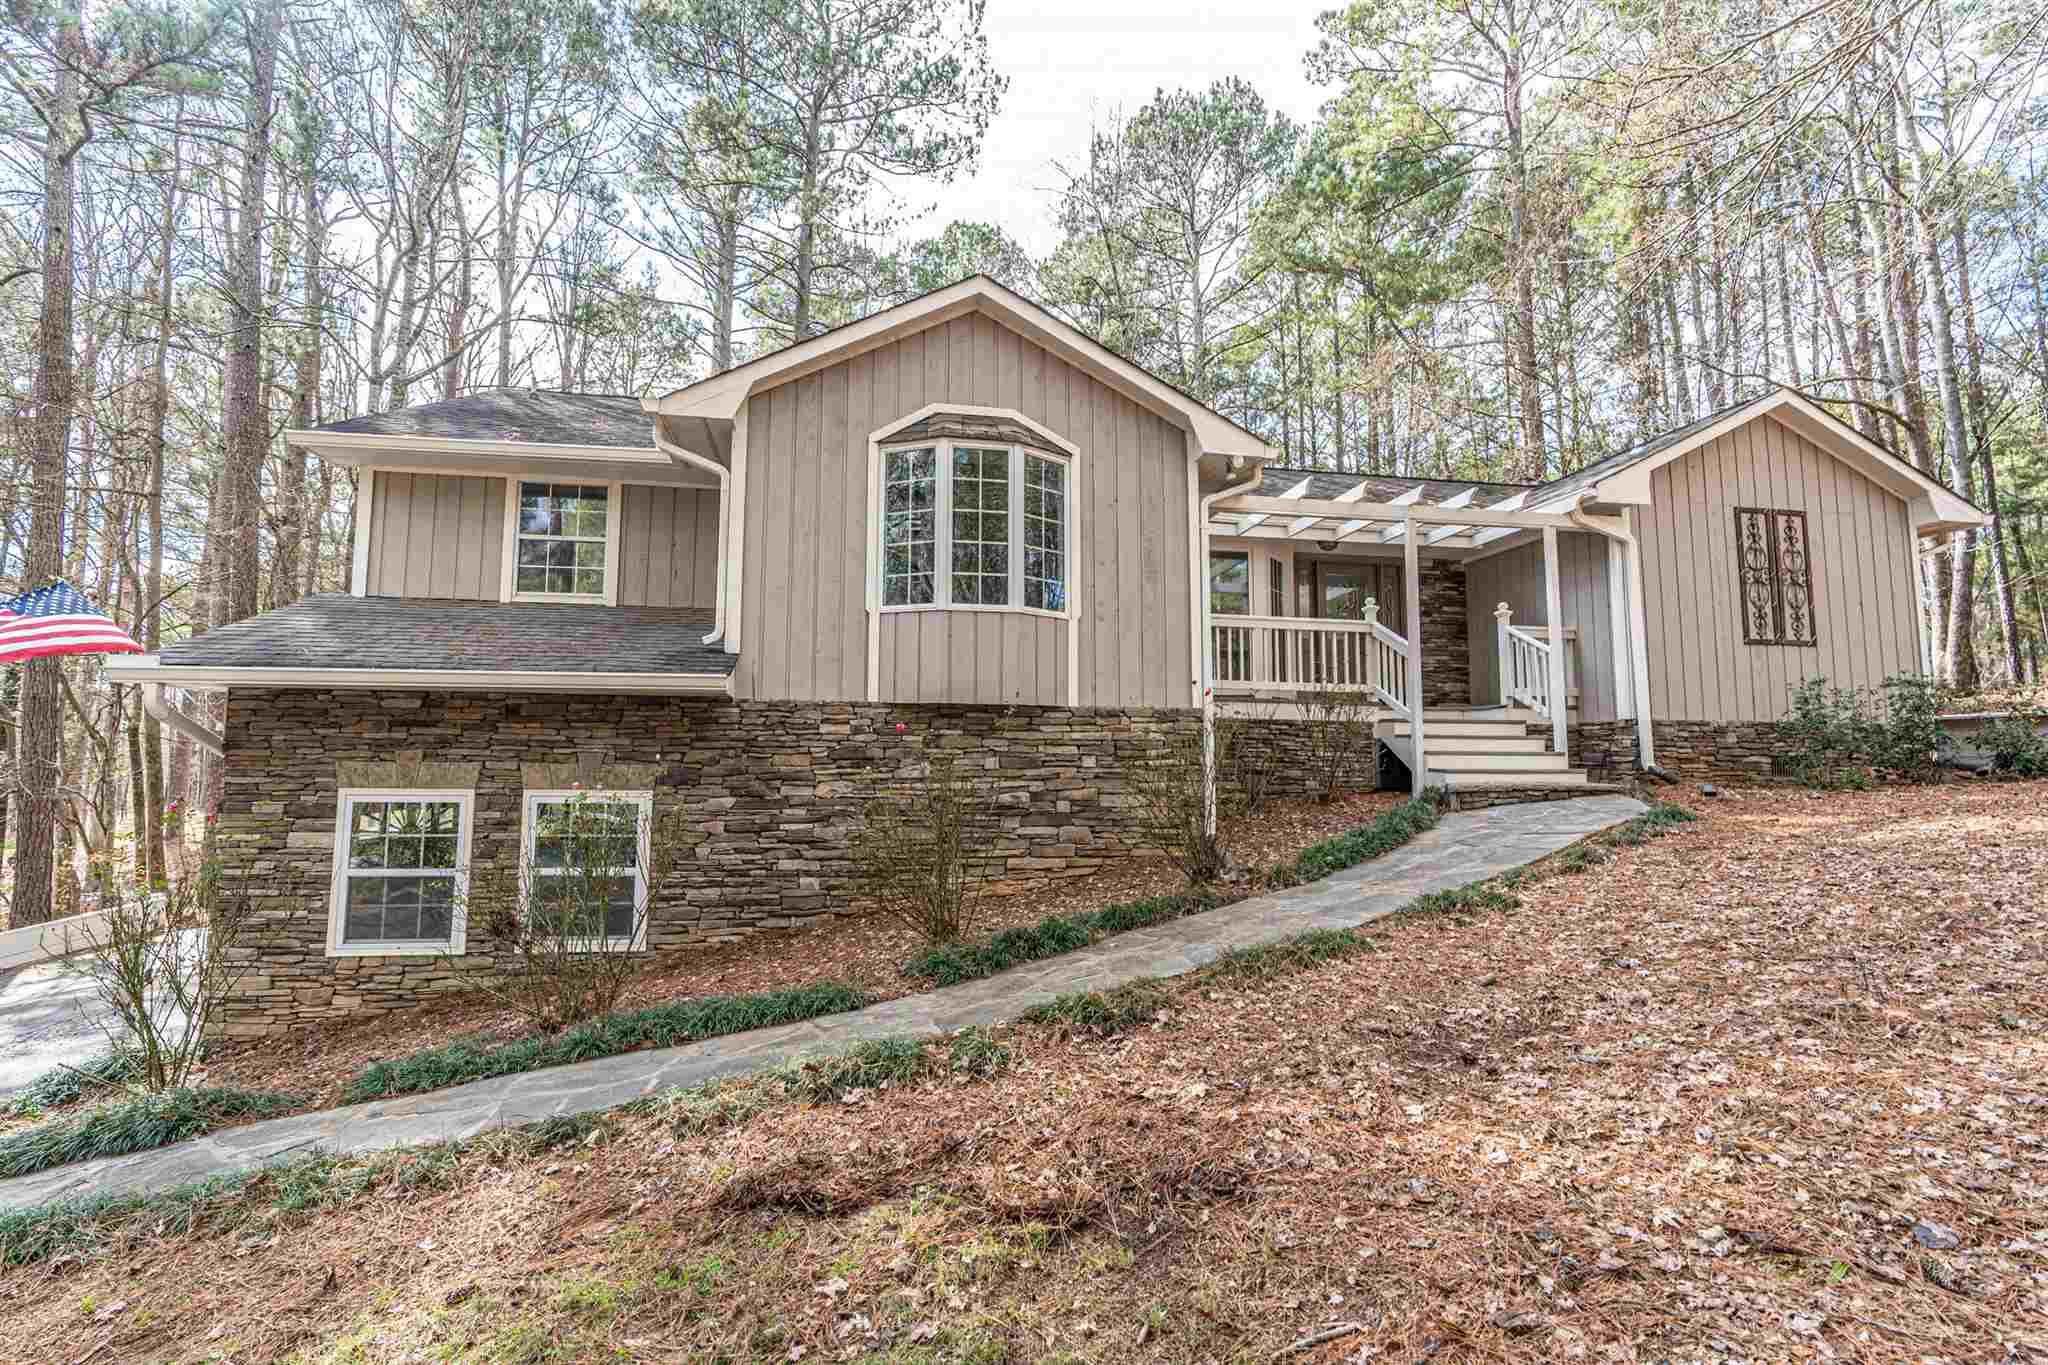 1011 ANCHOR BAY CIRCLE, Lake Oconee Reynolds Landing in Greene County, GA 30642 Home for Sale